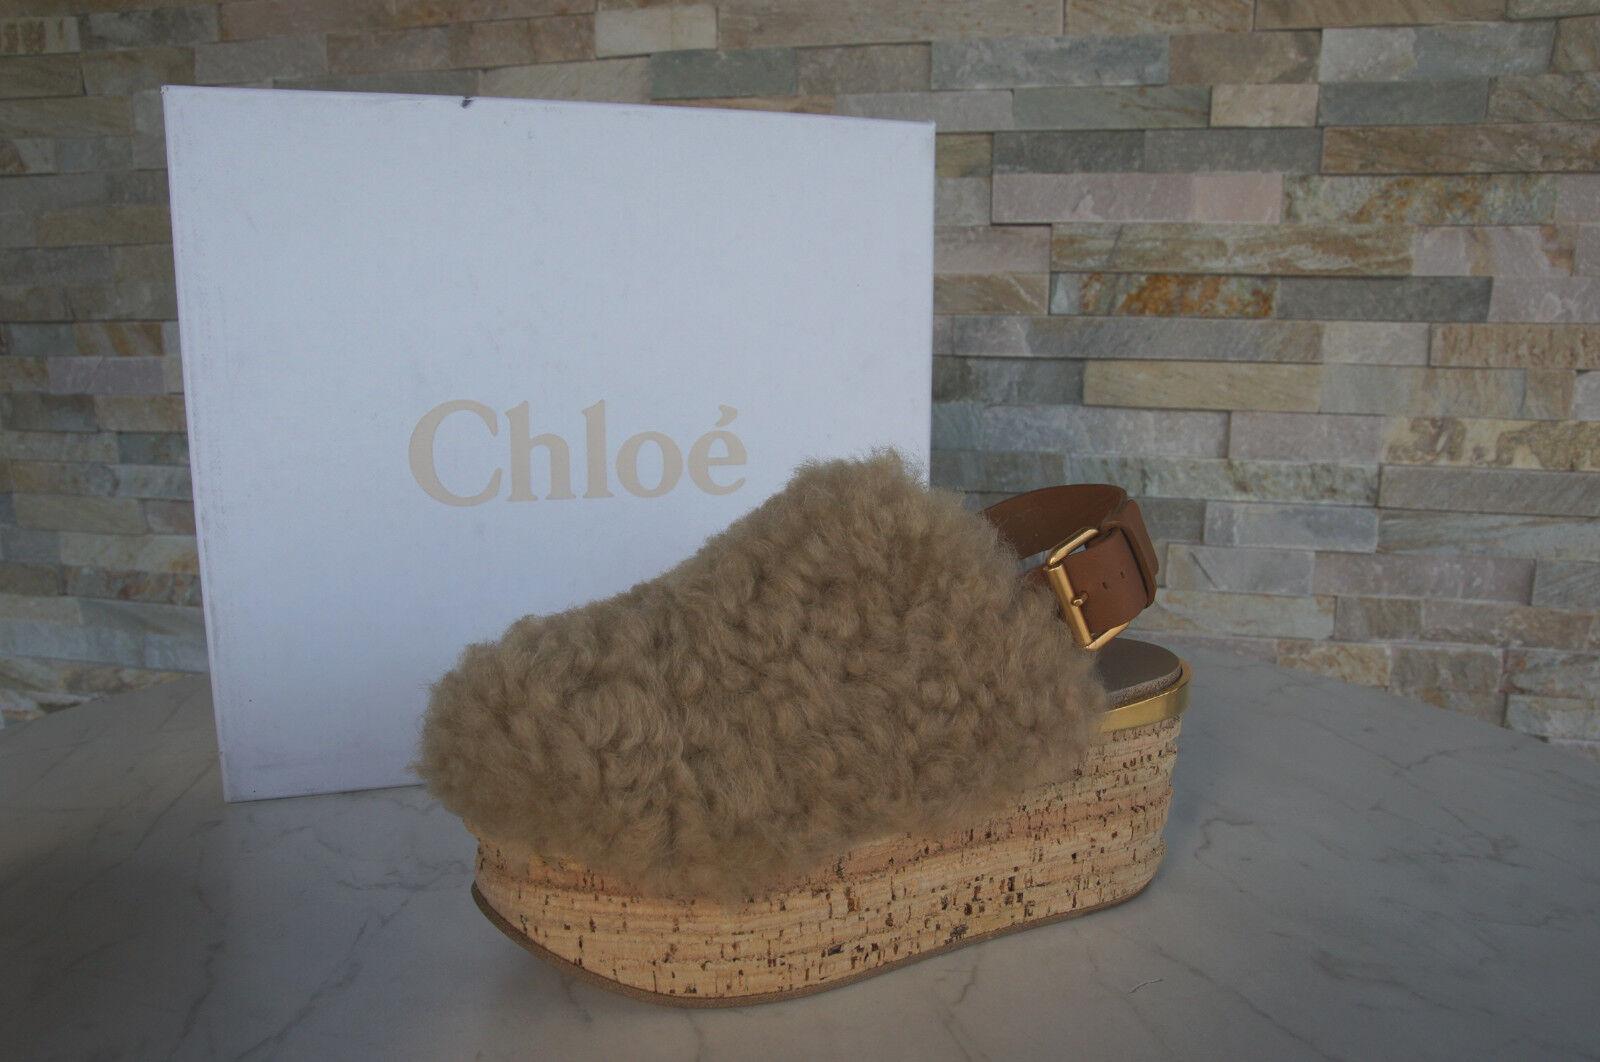 Chloé Chloe 36 oveja oveja oveja fell plataforma sabot sandalias mules zapatos nuevo ehemuvp  ventas en linea